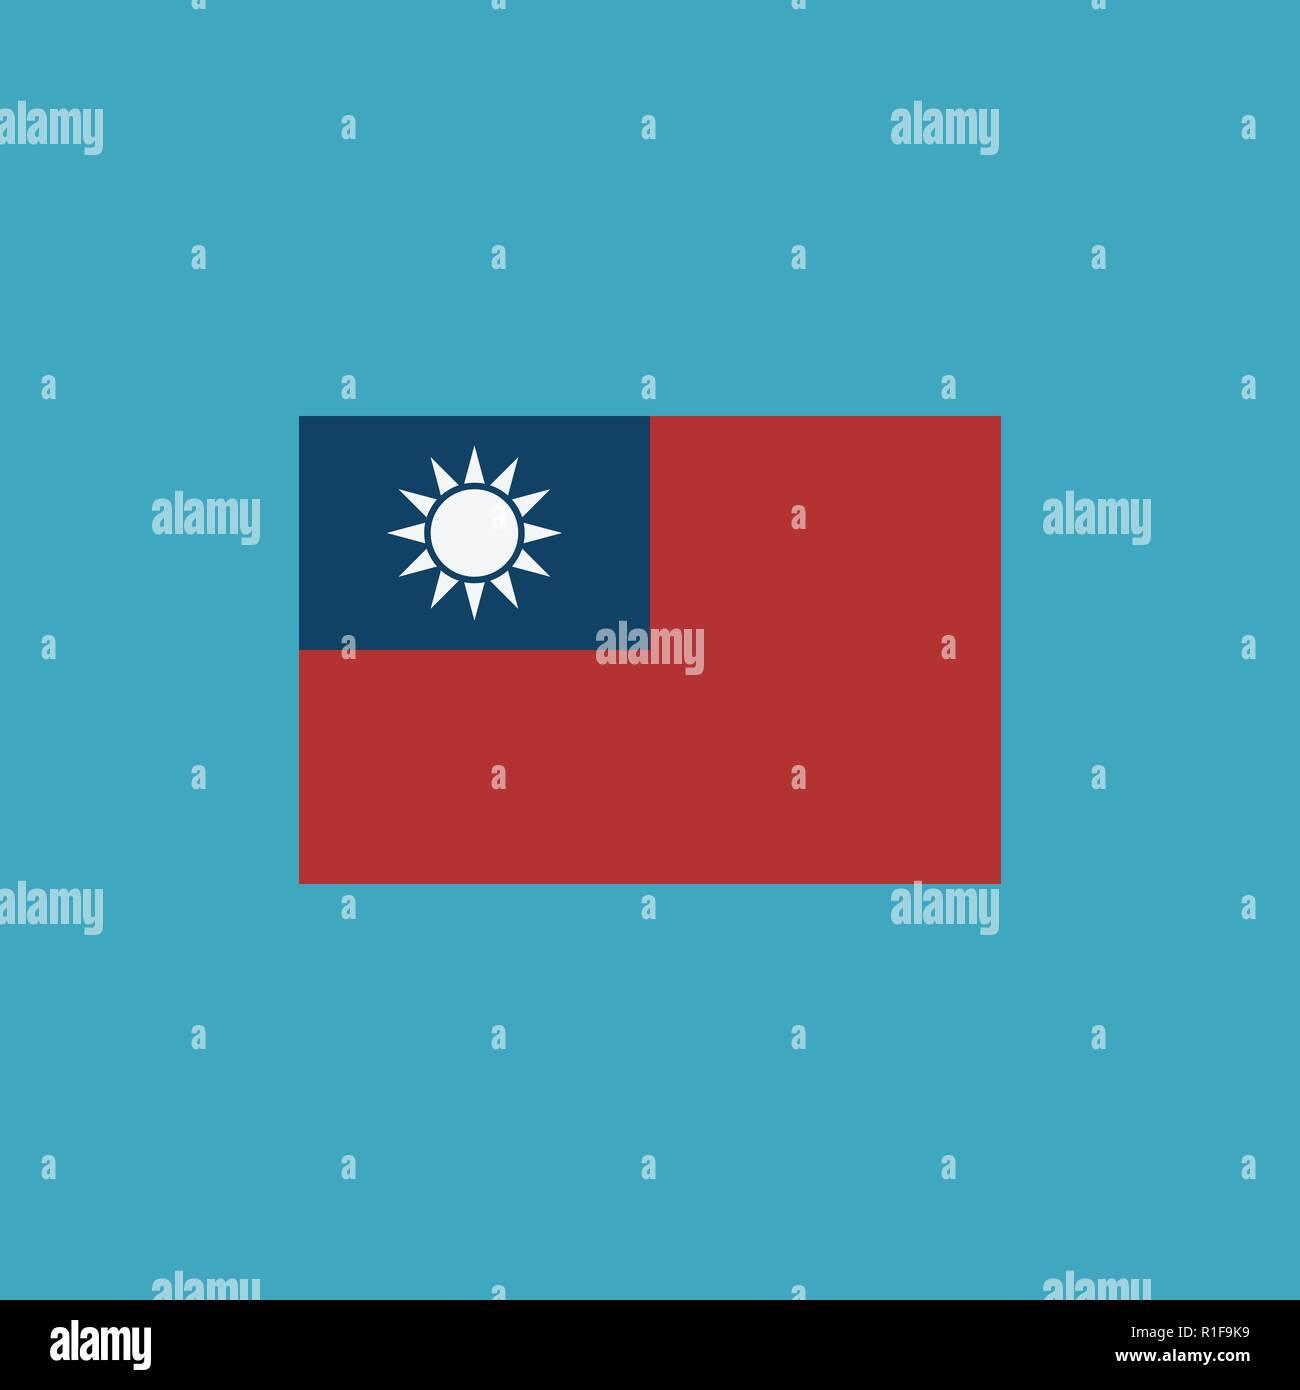 Bank Of Marin Stock Quote: Taiwan National Day Celebration Stock Photos & Taiwan